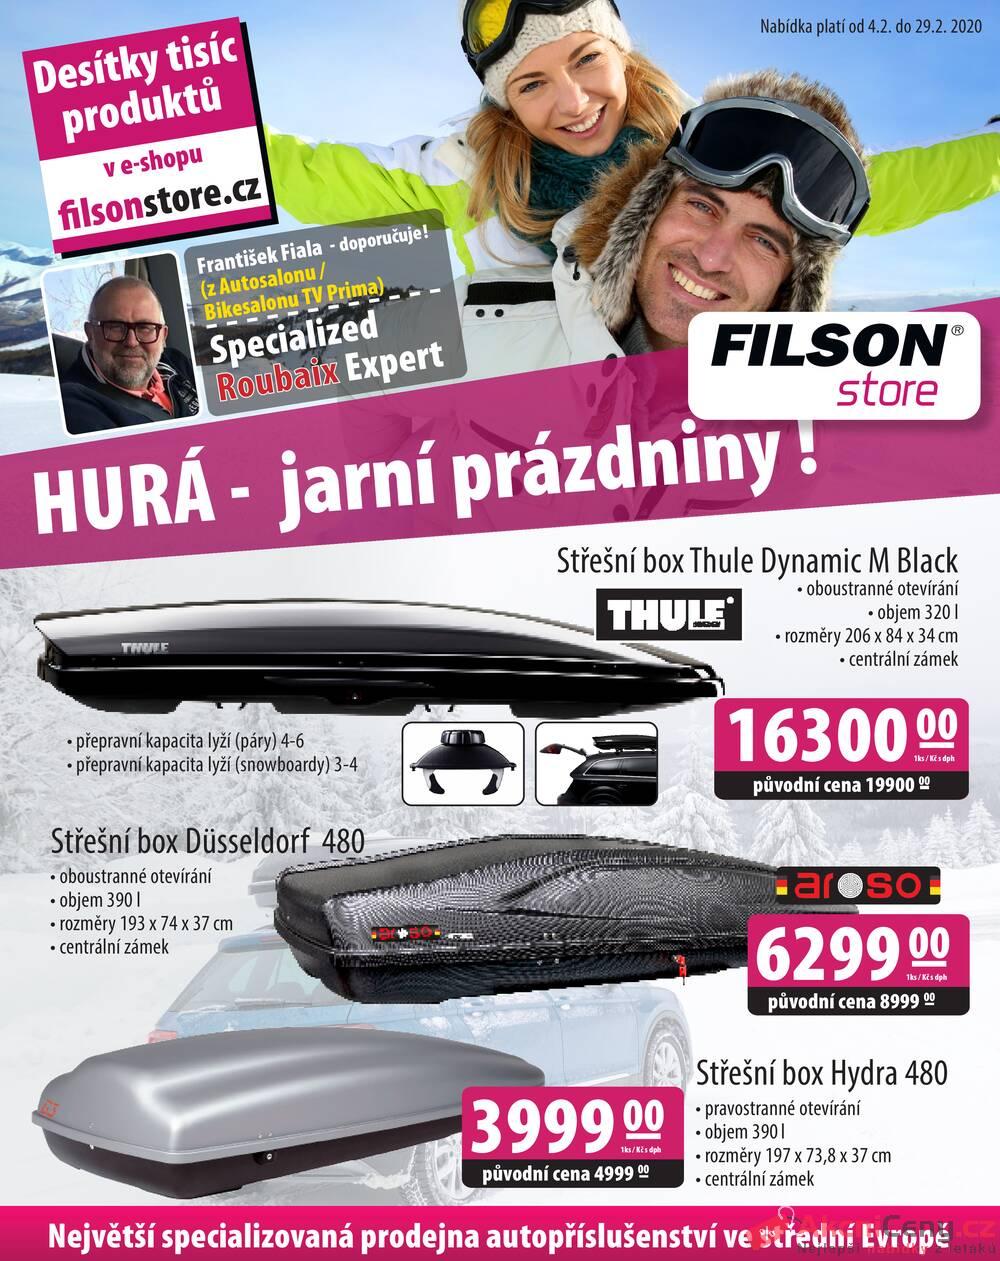 Leták Filson Store - Filson Store od 4.2. do 29.2.2020 - strana 1